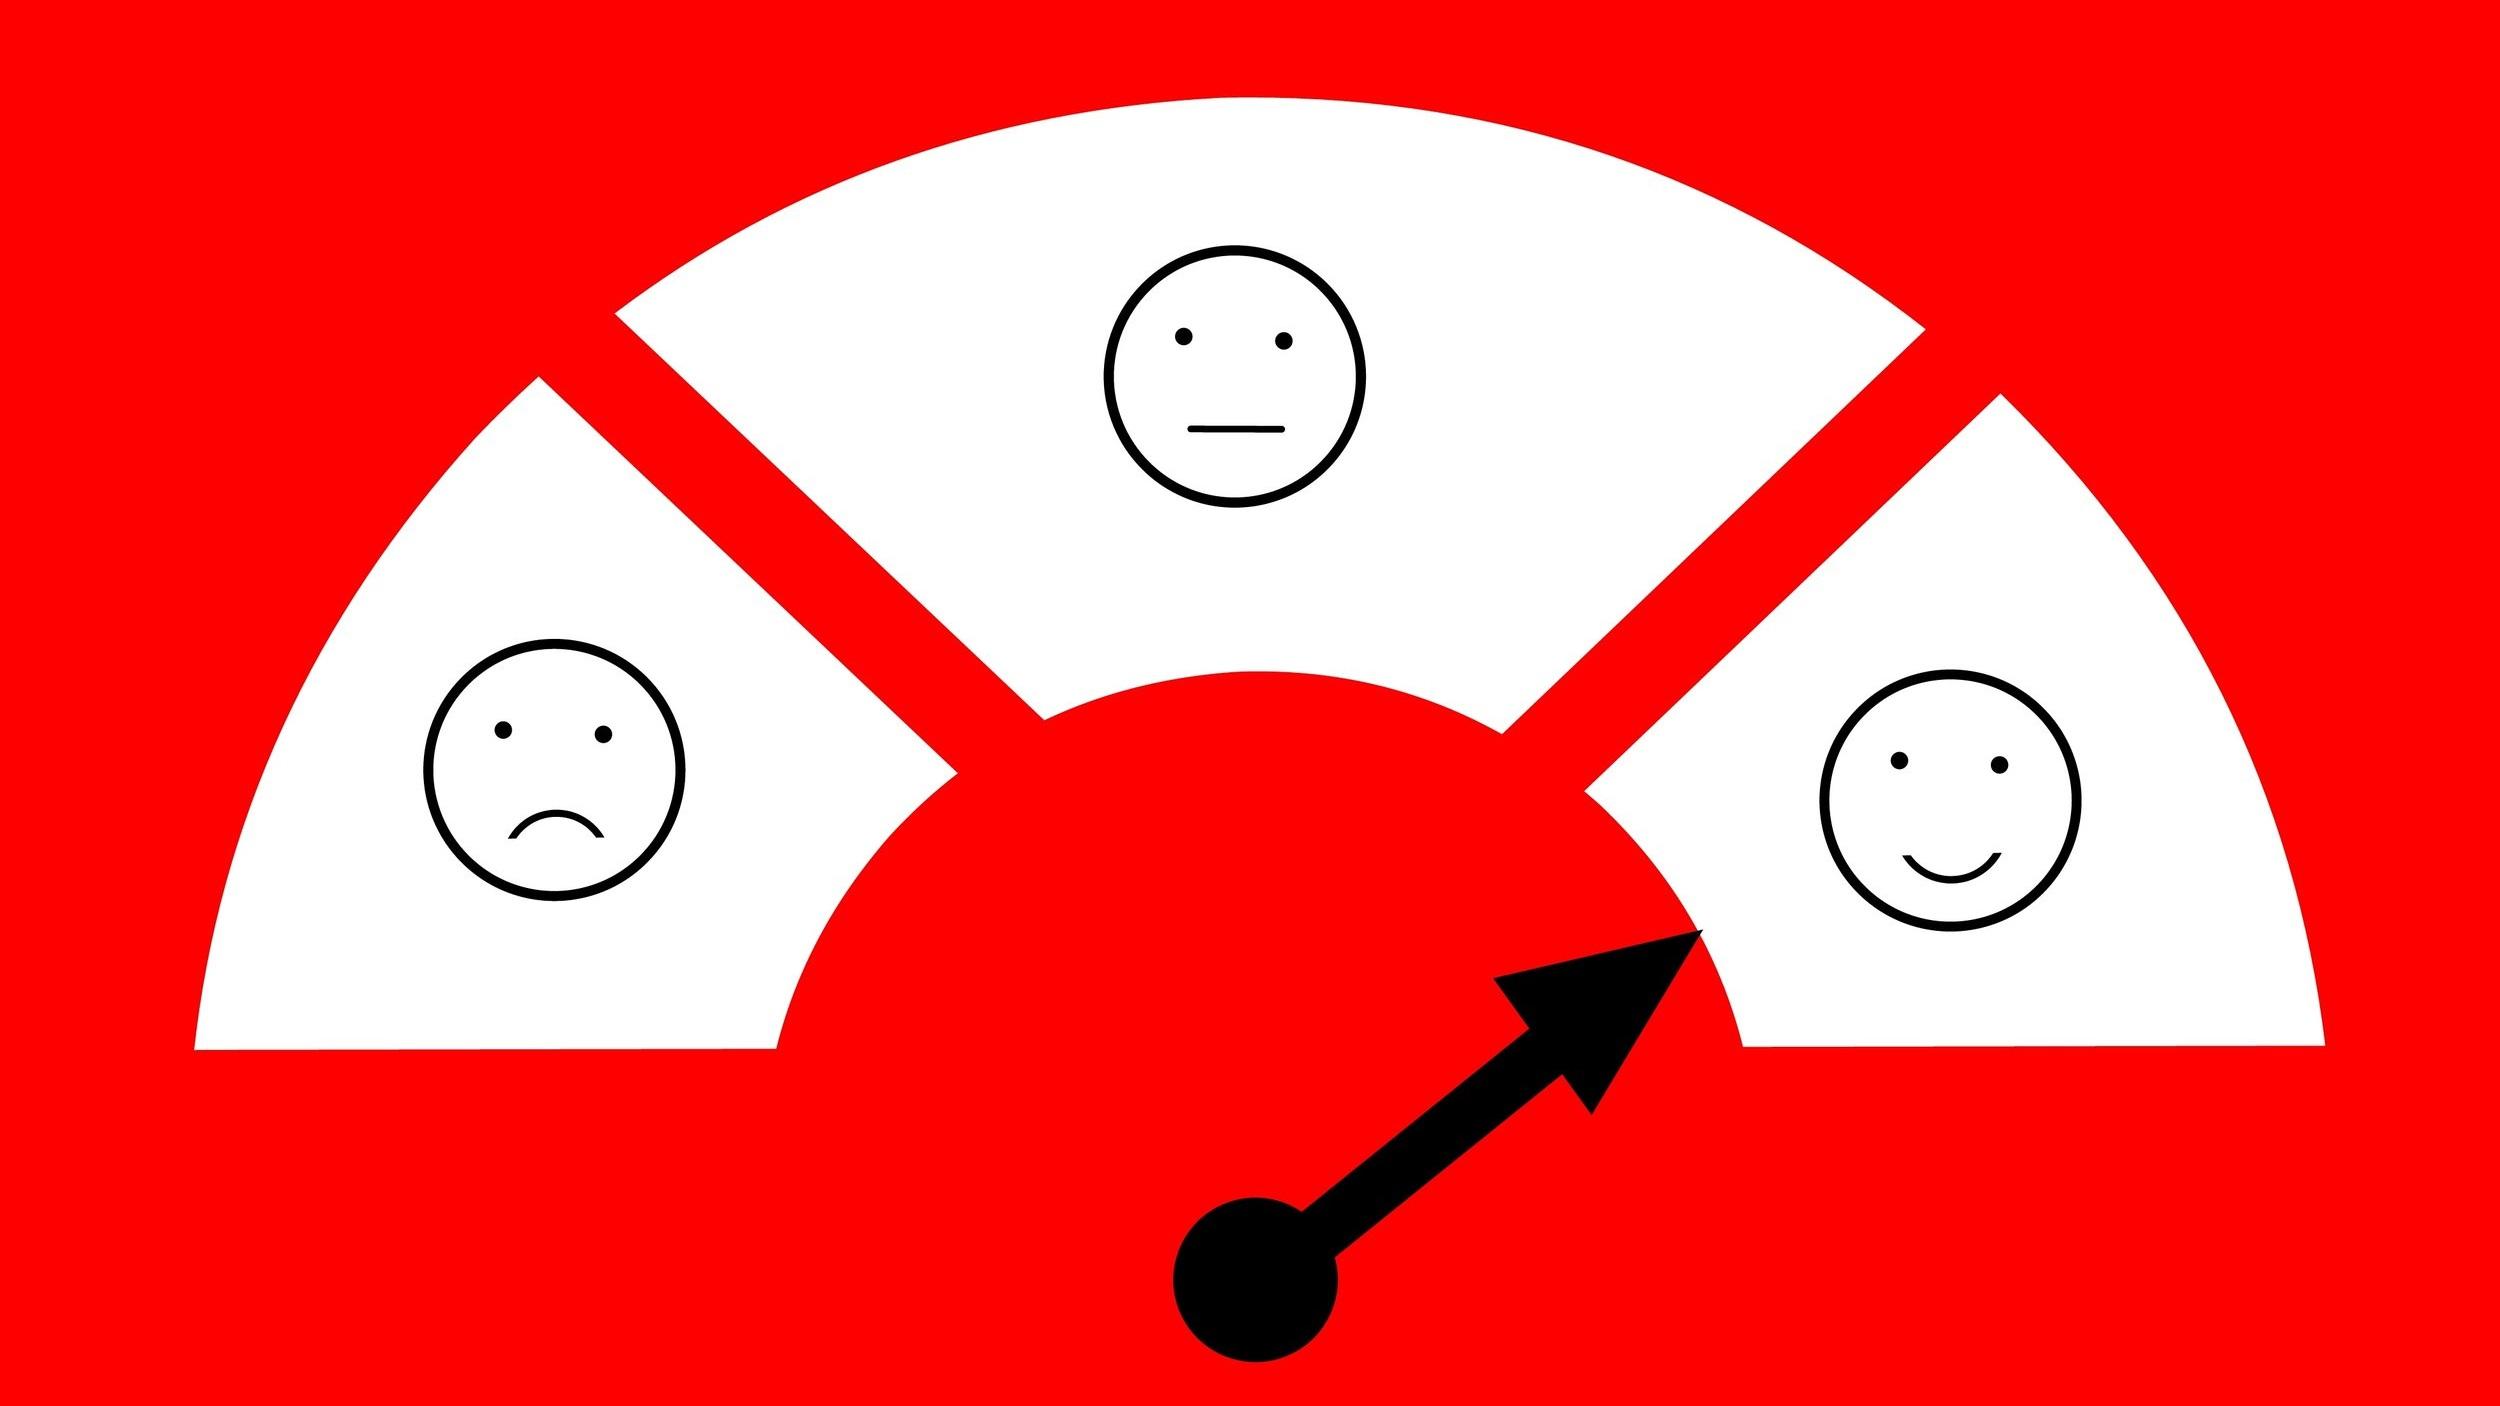 feedback-satisfaction-customer-client-survey-emoticon-1447521-pxhere.com.jpg